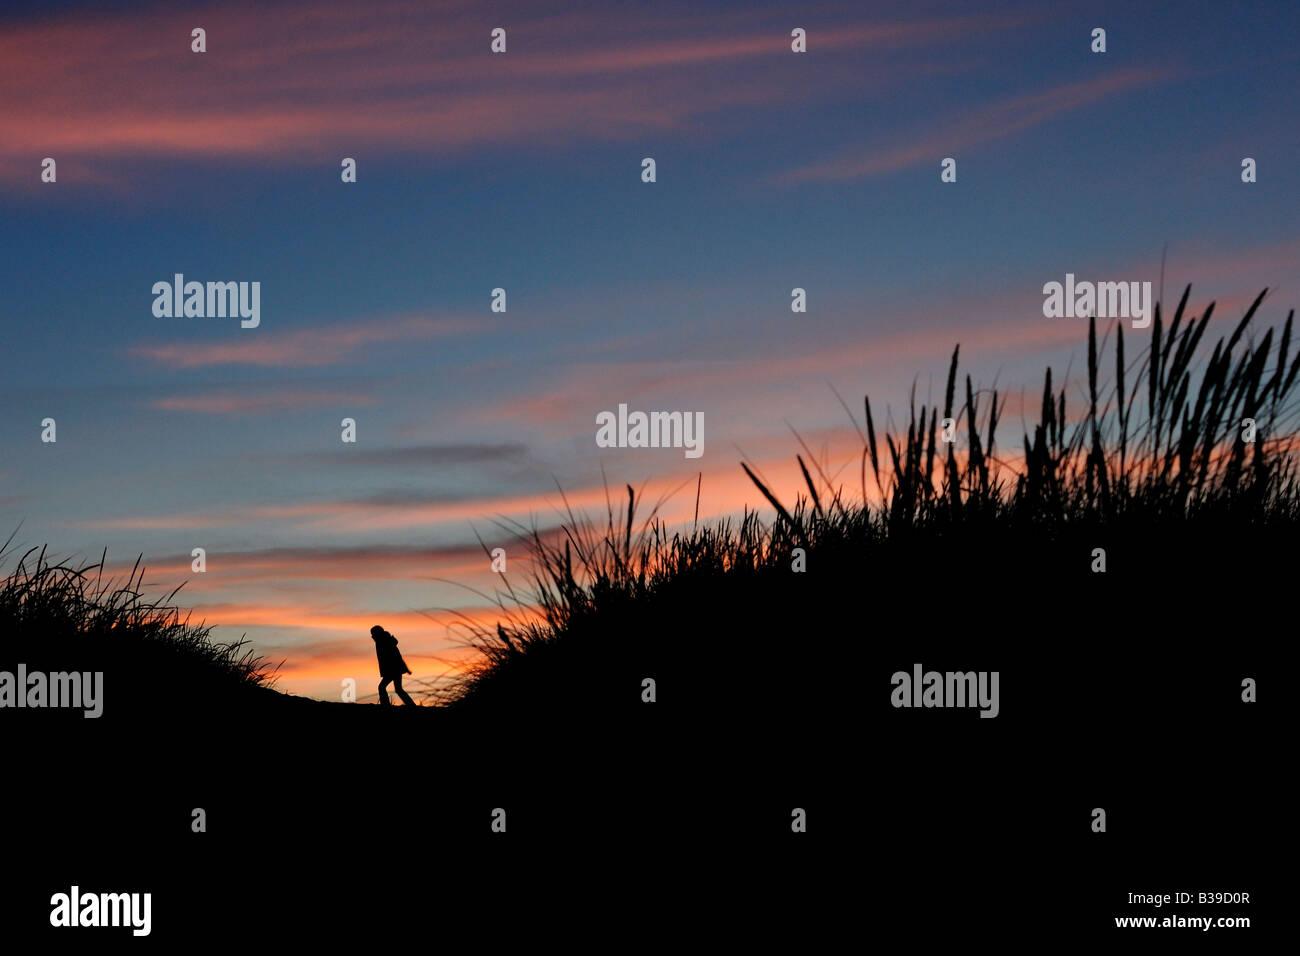 Mädchen in den Dünen bei Sonnenuntergang young girl in dunes in the sunset - Stock Image